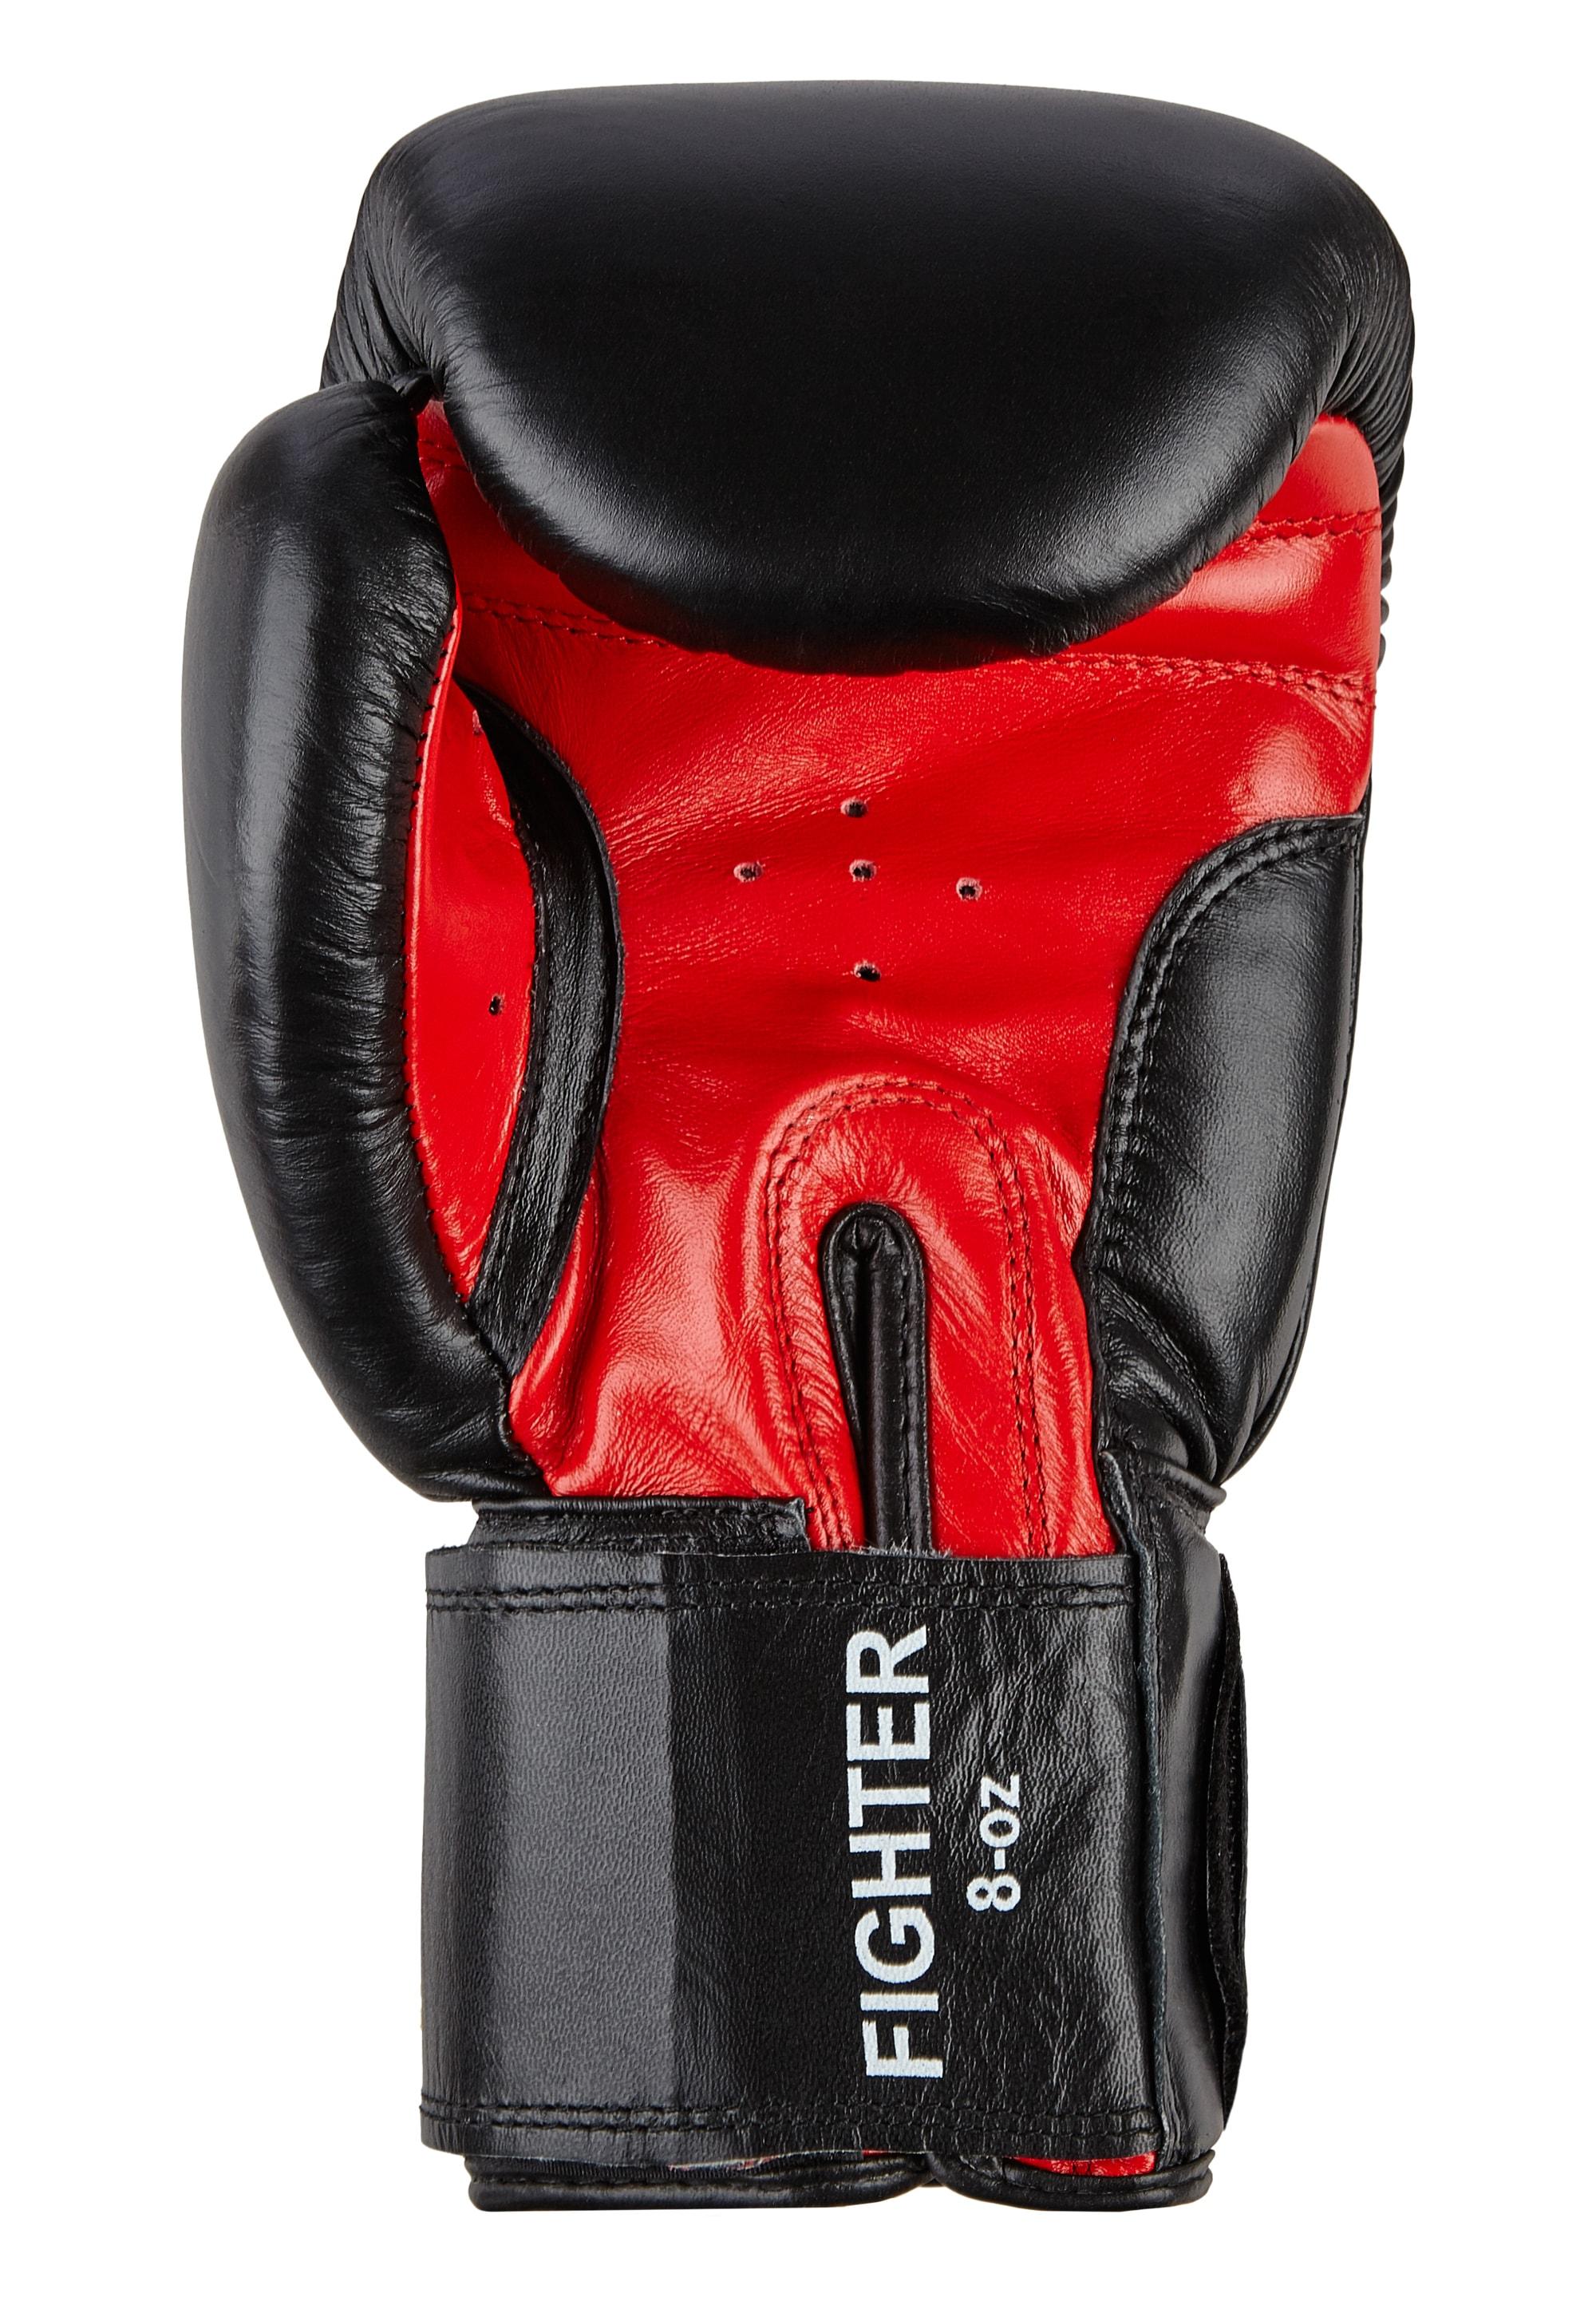 Benlee Rocky Marciano Boxhandschuhe mit Daumenverschluss FIGHTER   Accessoires > Handschuhe > Sonstige Handschuhe   Benlee Rocky Marciano